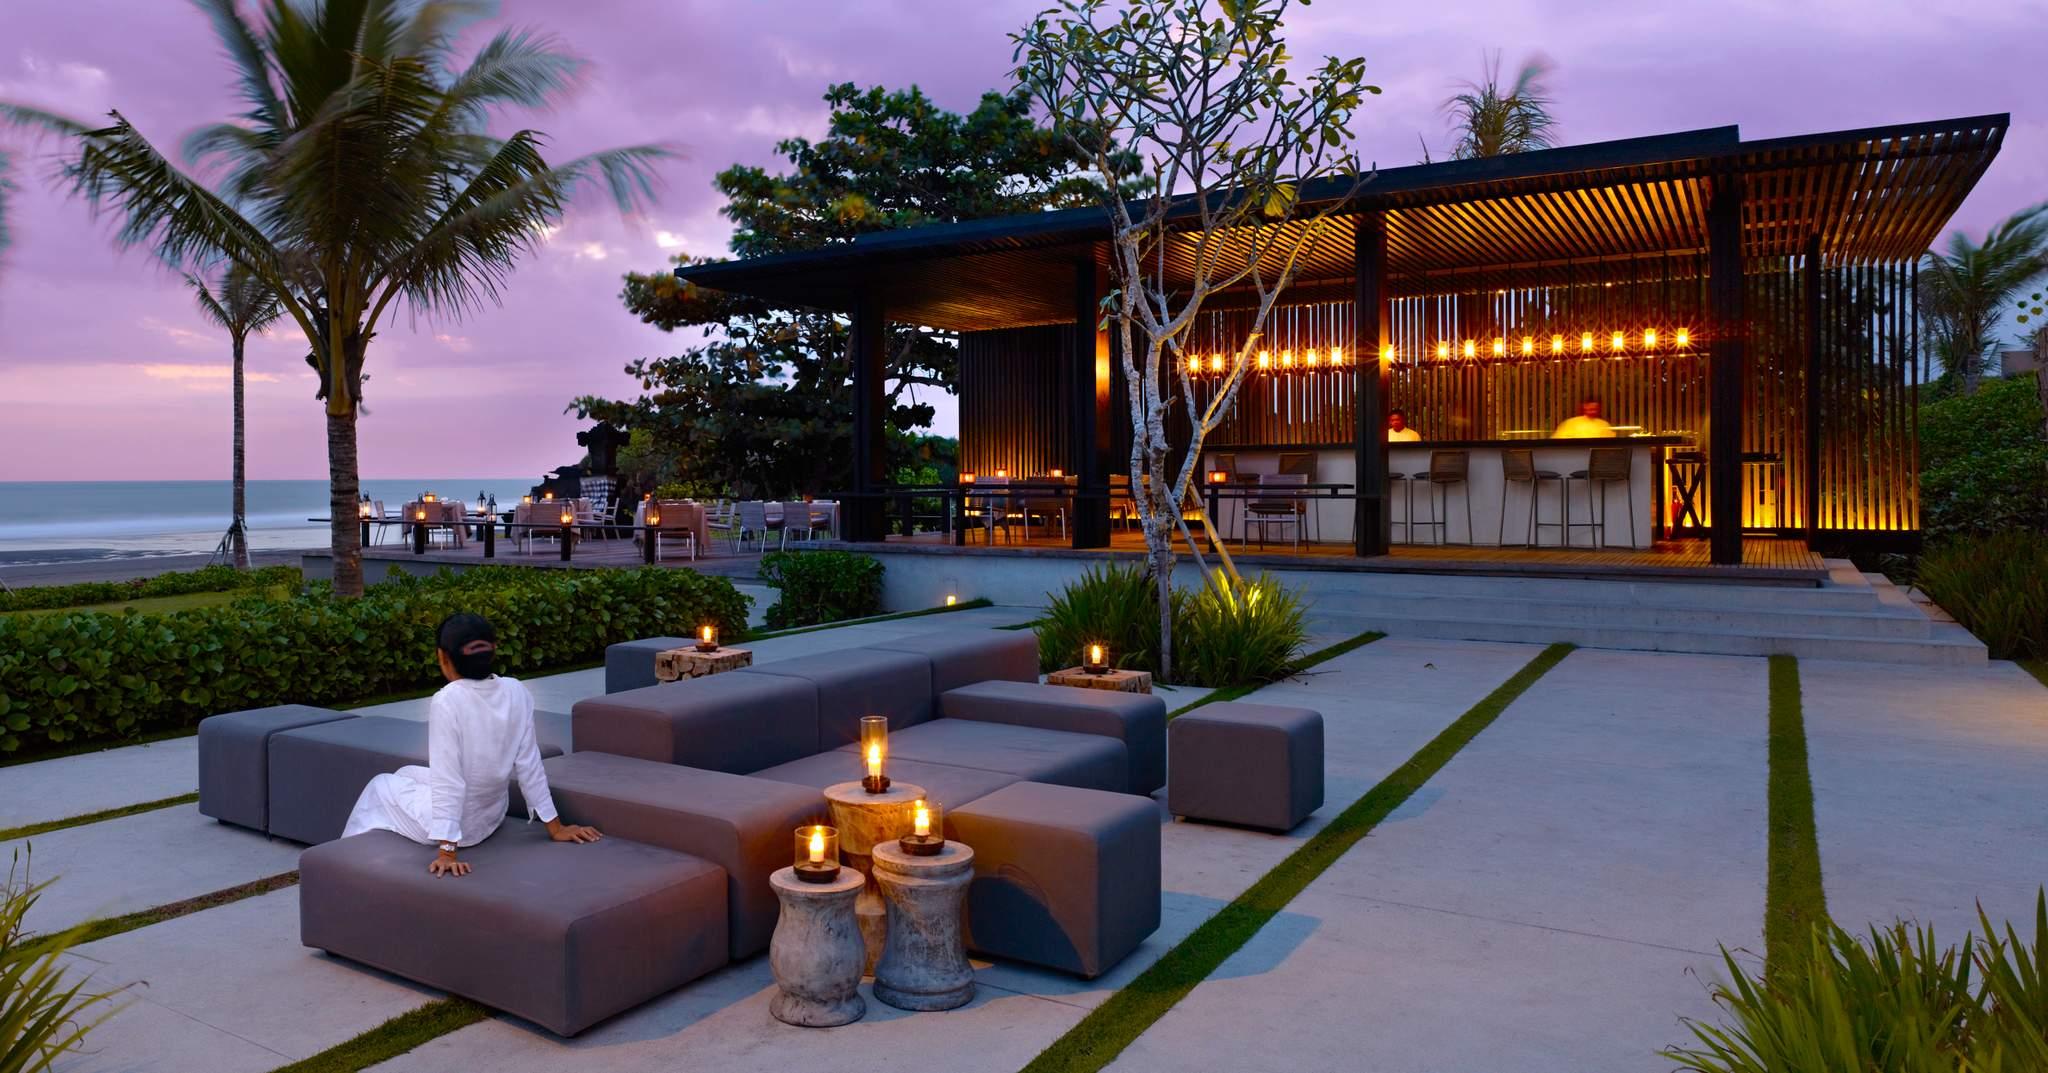 Soori bali in bali indonesia for Five star hotels in bali indonesia